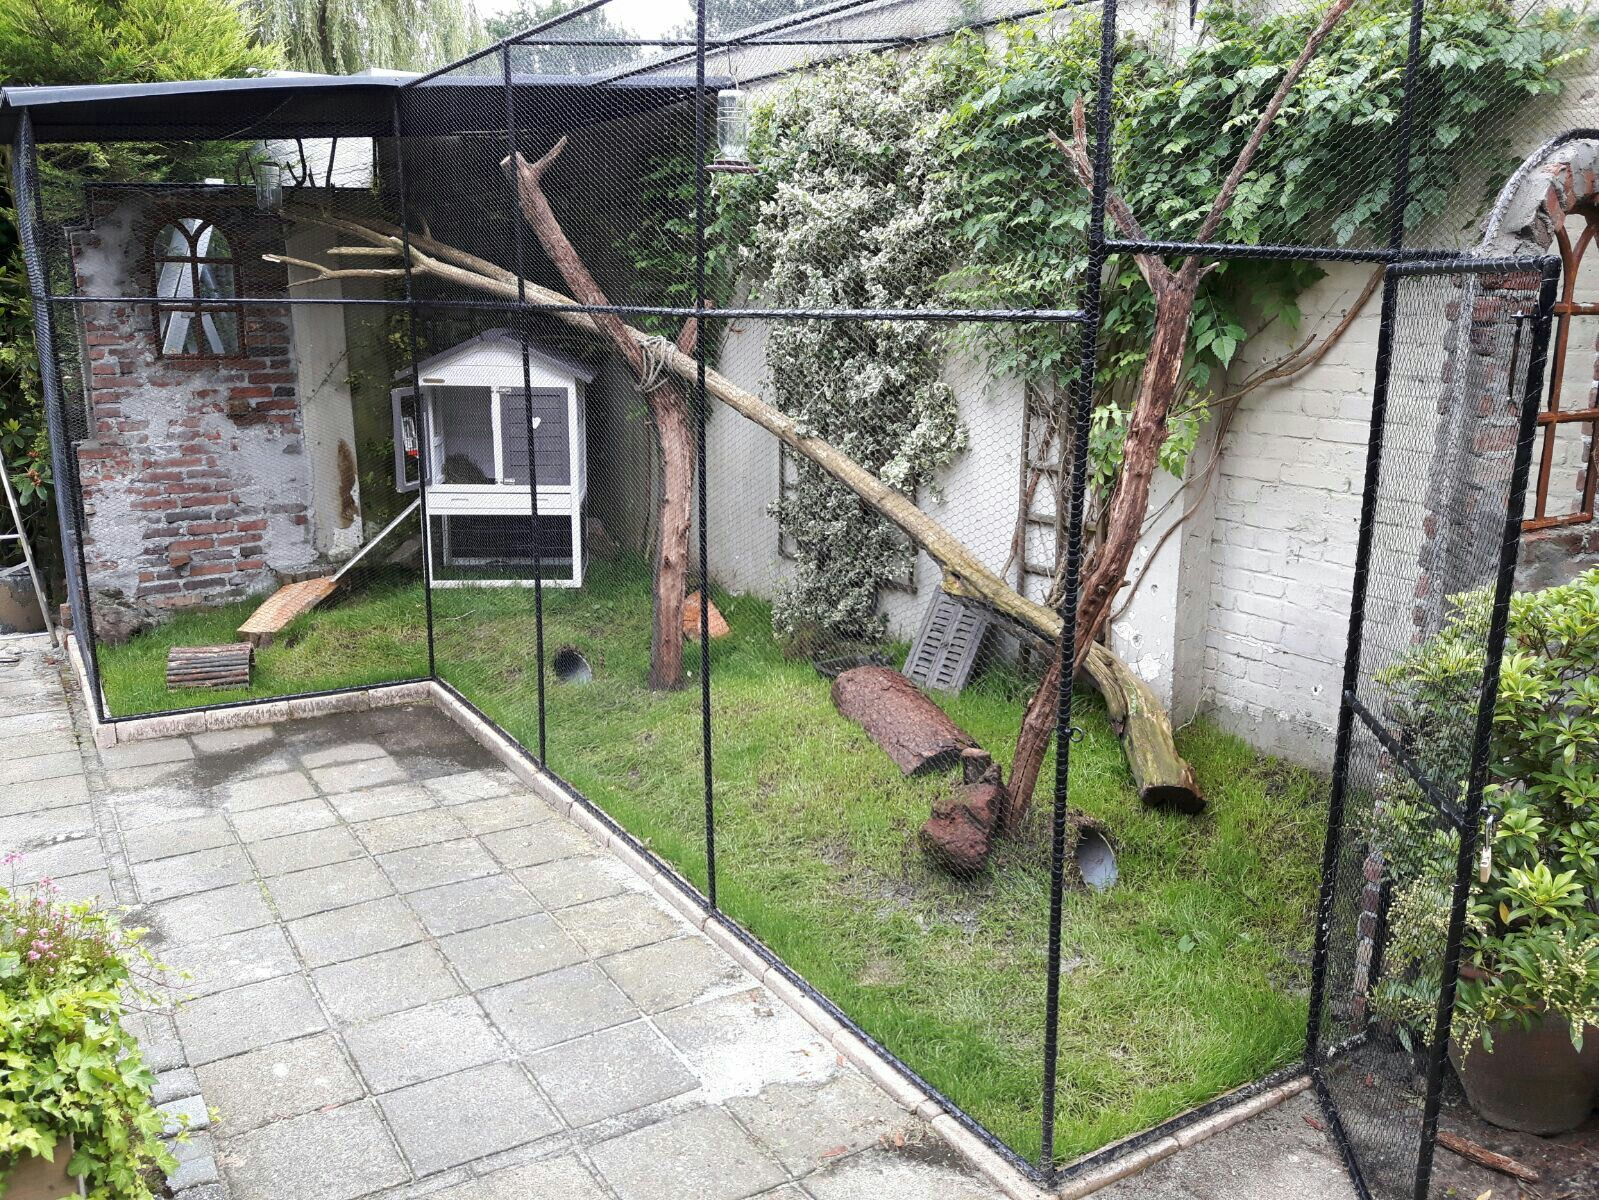 Rabbithouse Outdoor Konijnenren Konijnenkooi Buiten